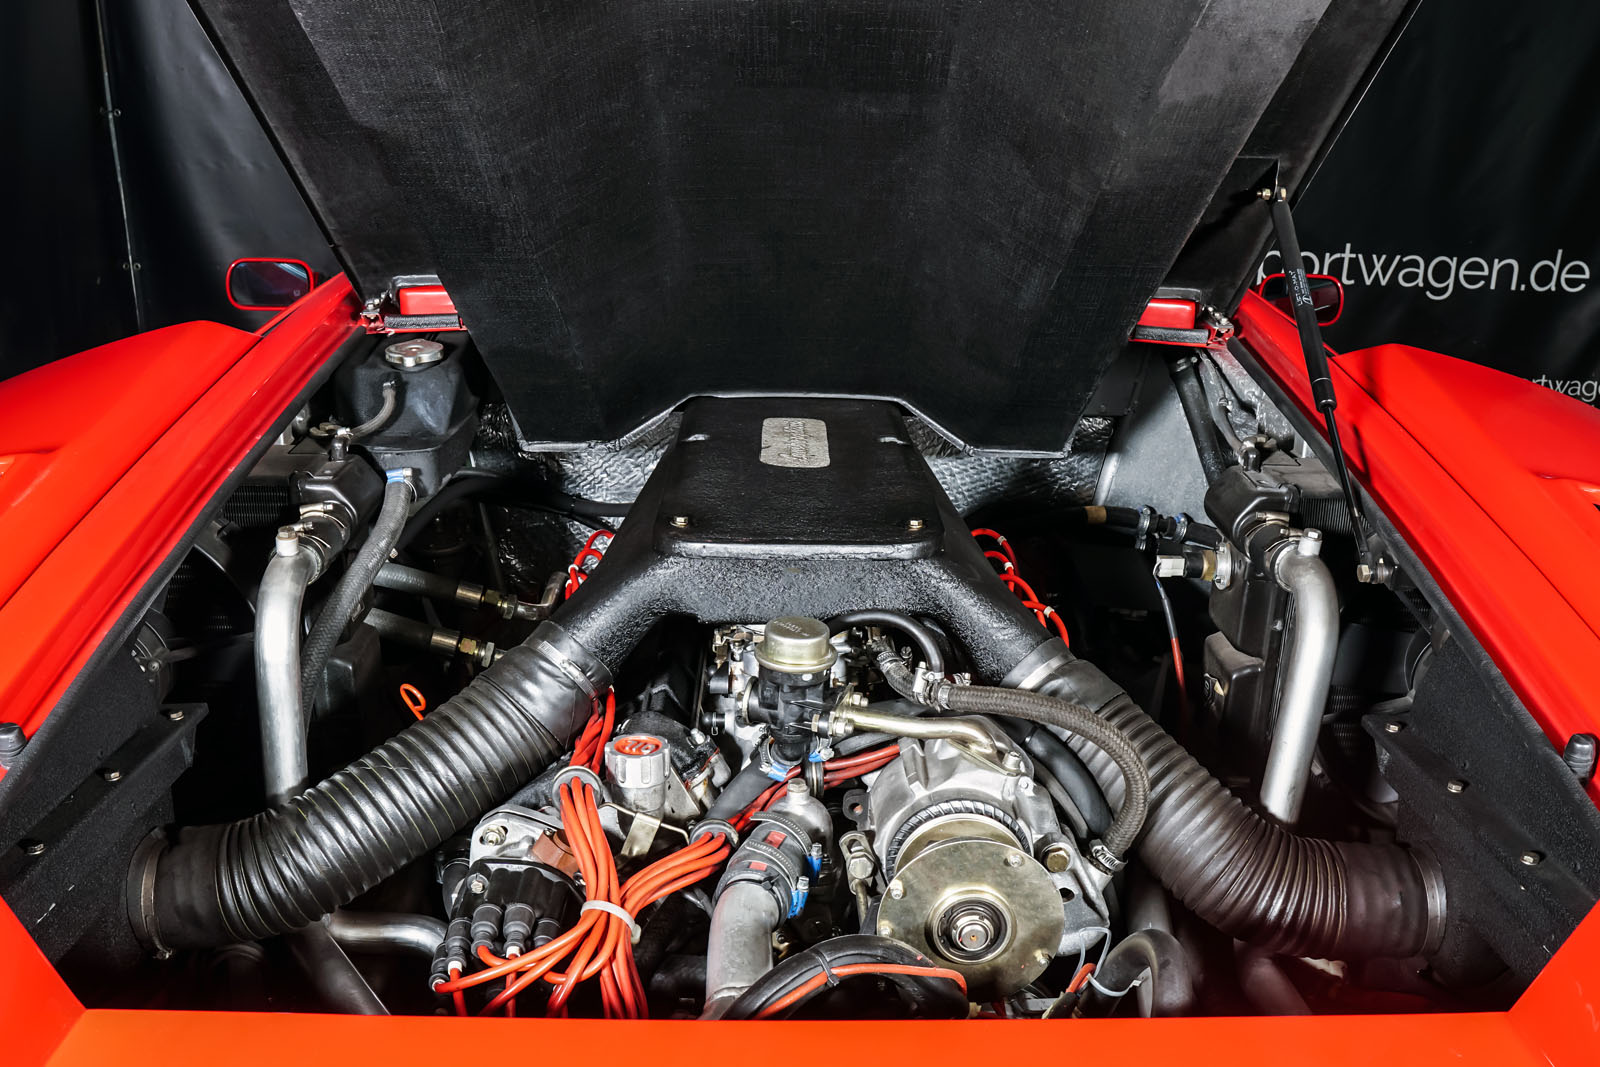 Lamborghini_Countach_Rot_Schwarz_LAM-2811_16_w